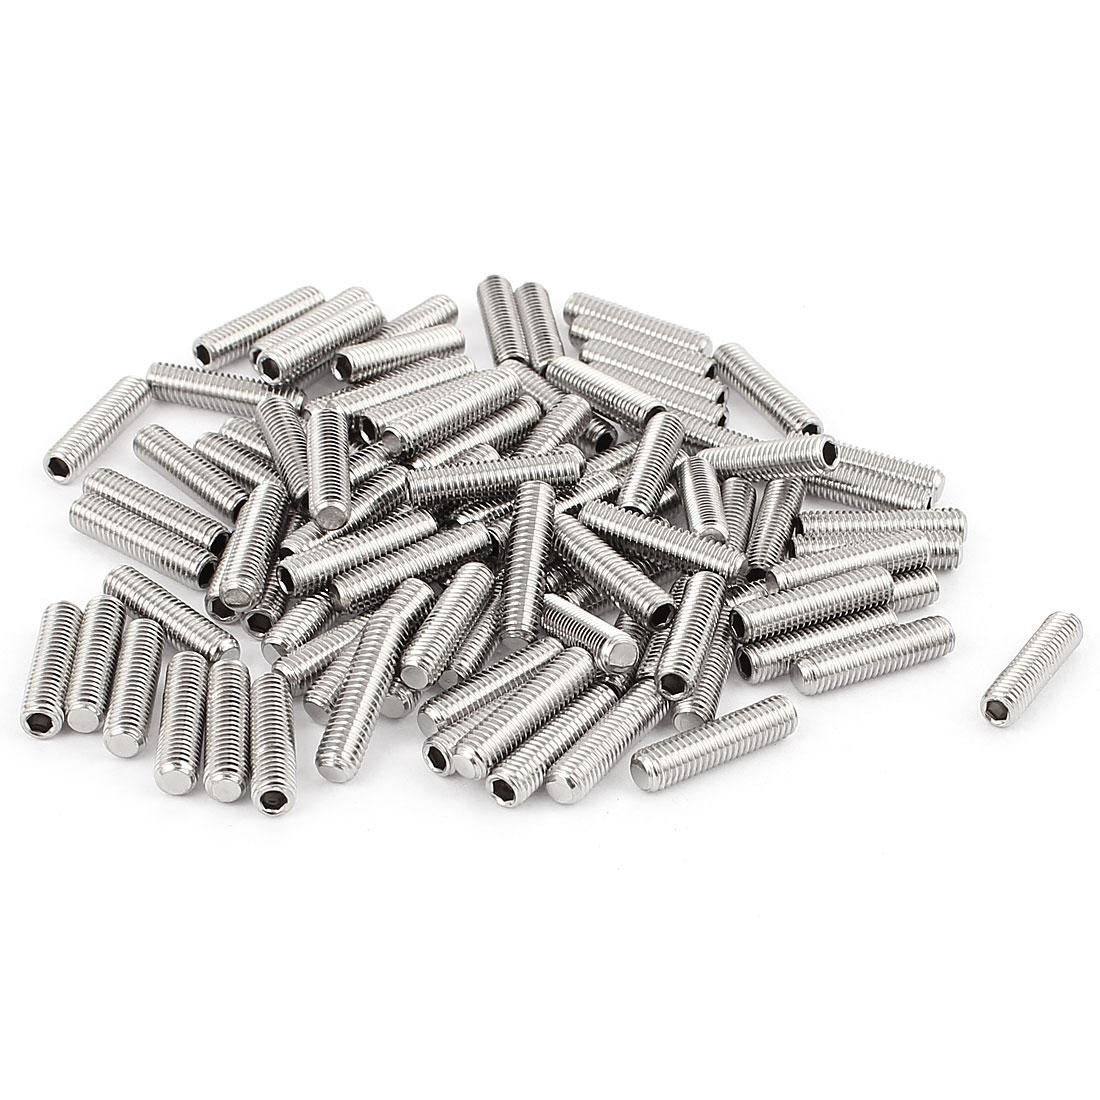 M5x20mm Stainless Steel Hex Socket Set Cap Point Grub Screws Silver Tone 100Pcs